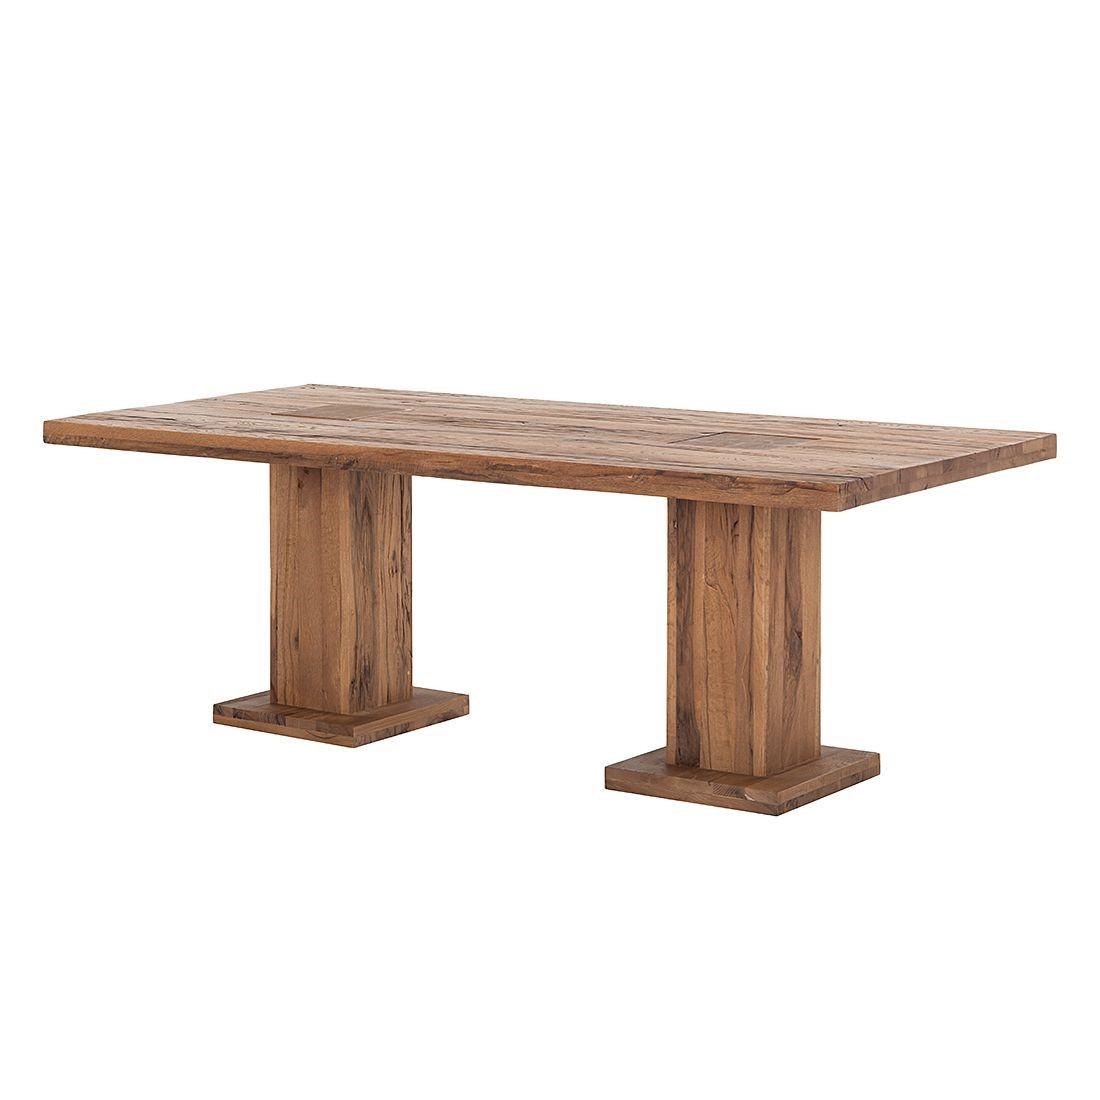 Home 24 - Table colonne chamber (2 colonnes) - différentes tailles disponibles chêne massif, bassano verni - 220 x 100 cm, ars natura